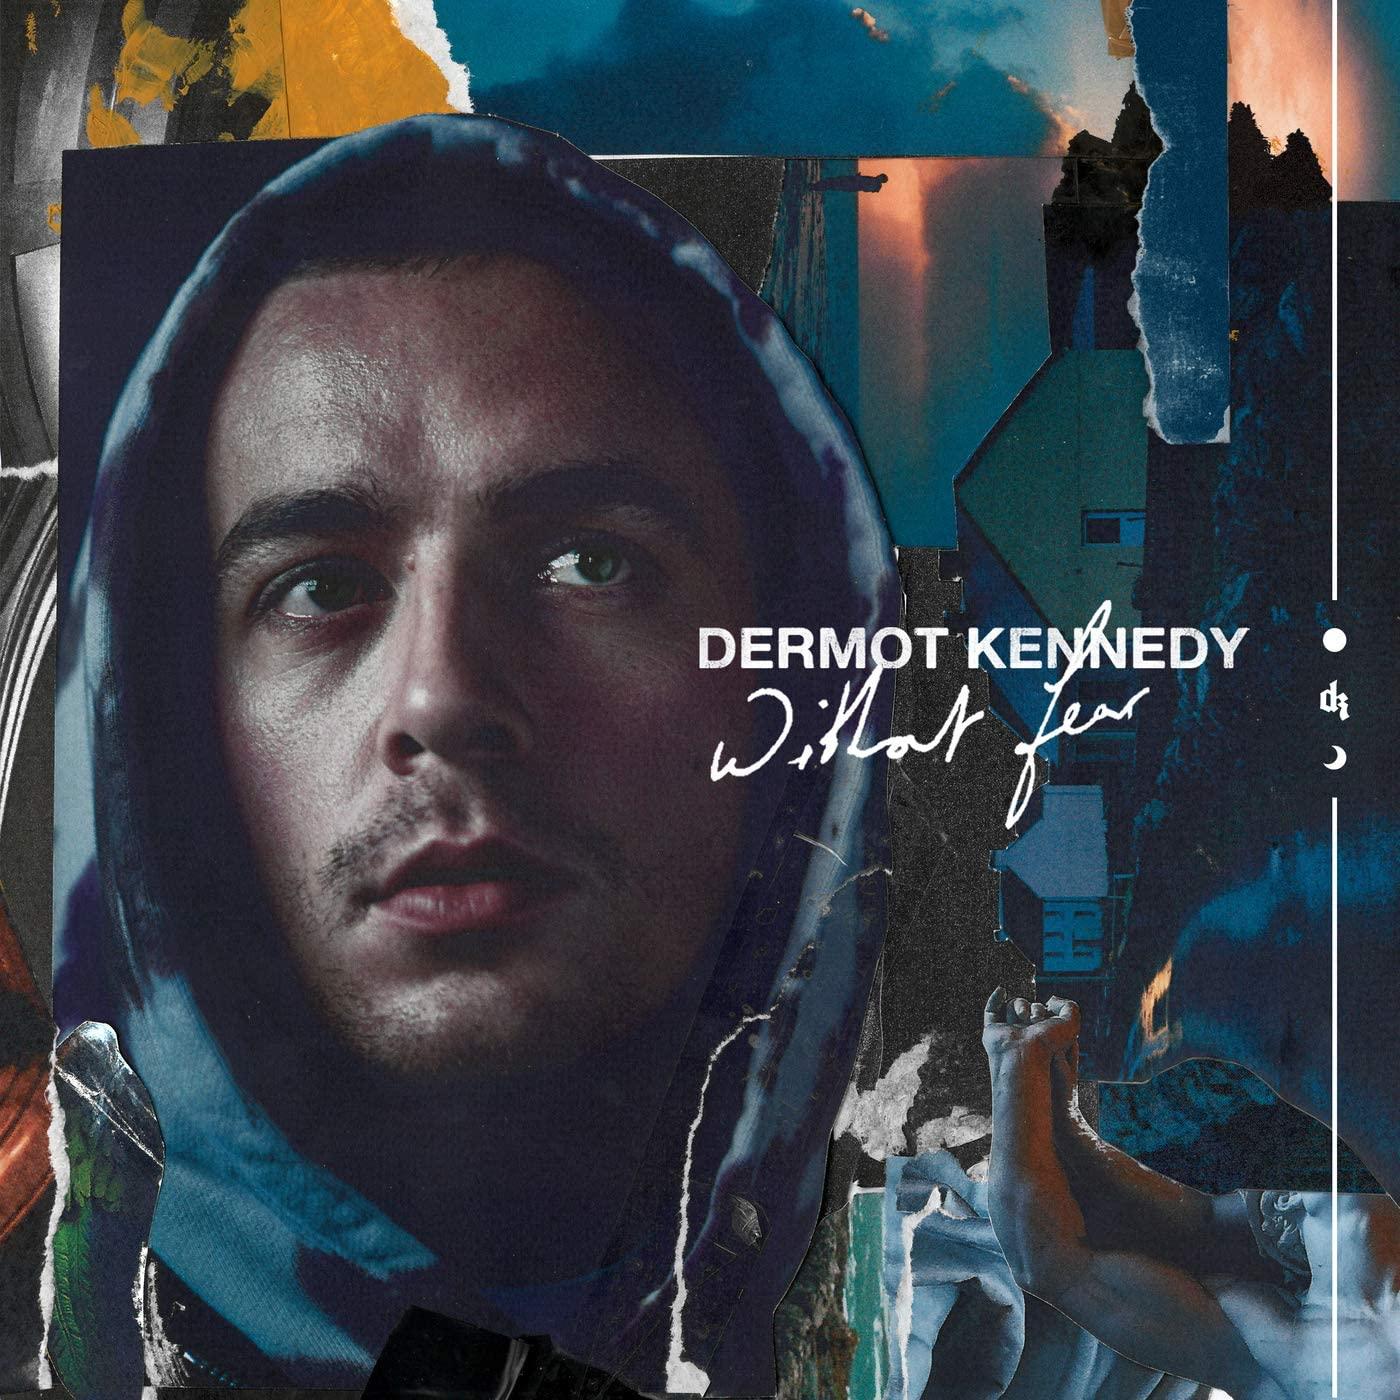 Dermot_kennedy